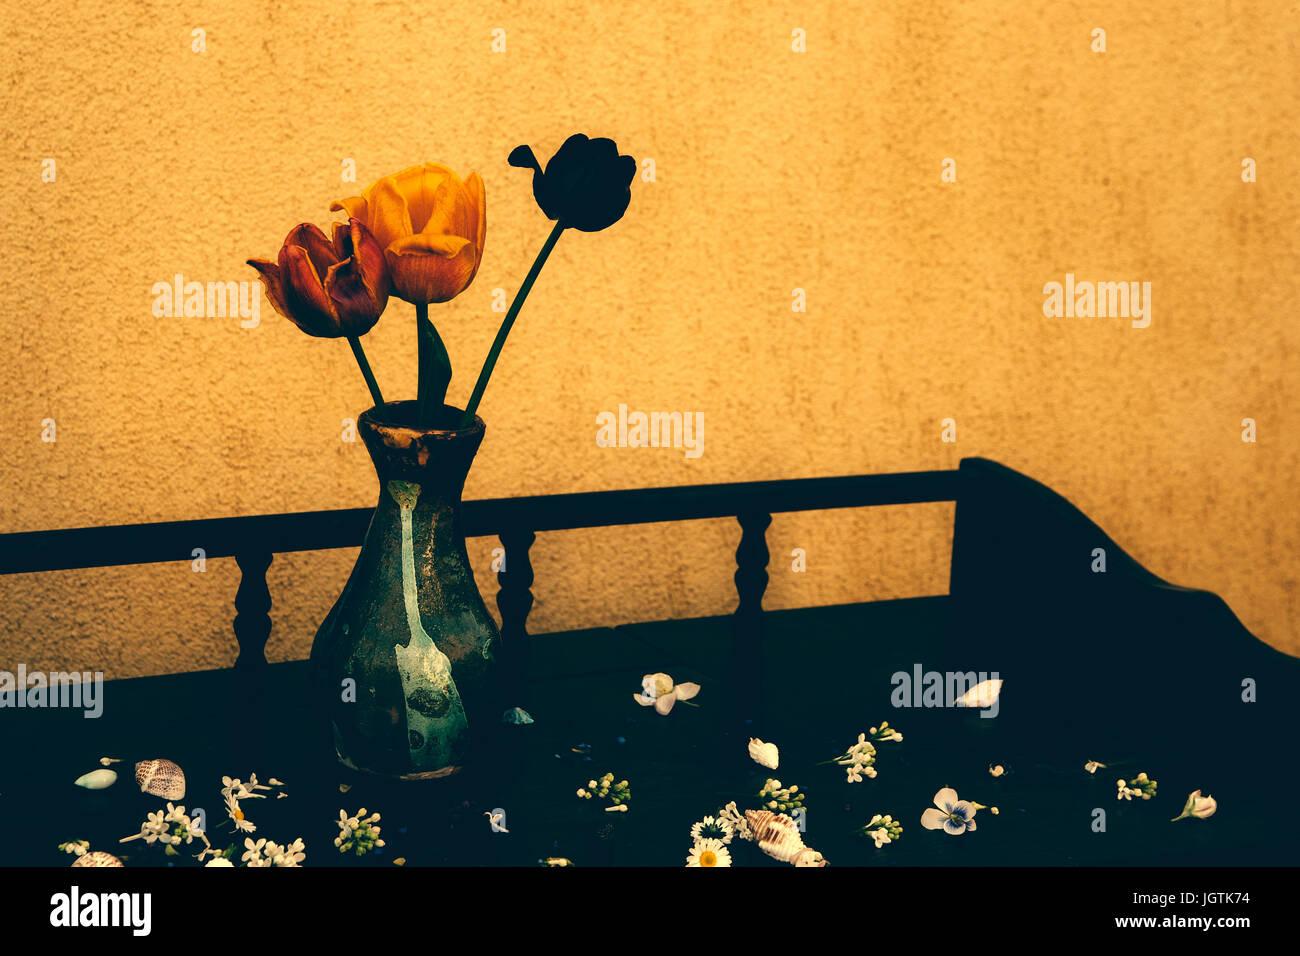 Tulip flowers in vase - Stock Image